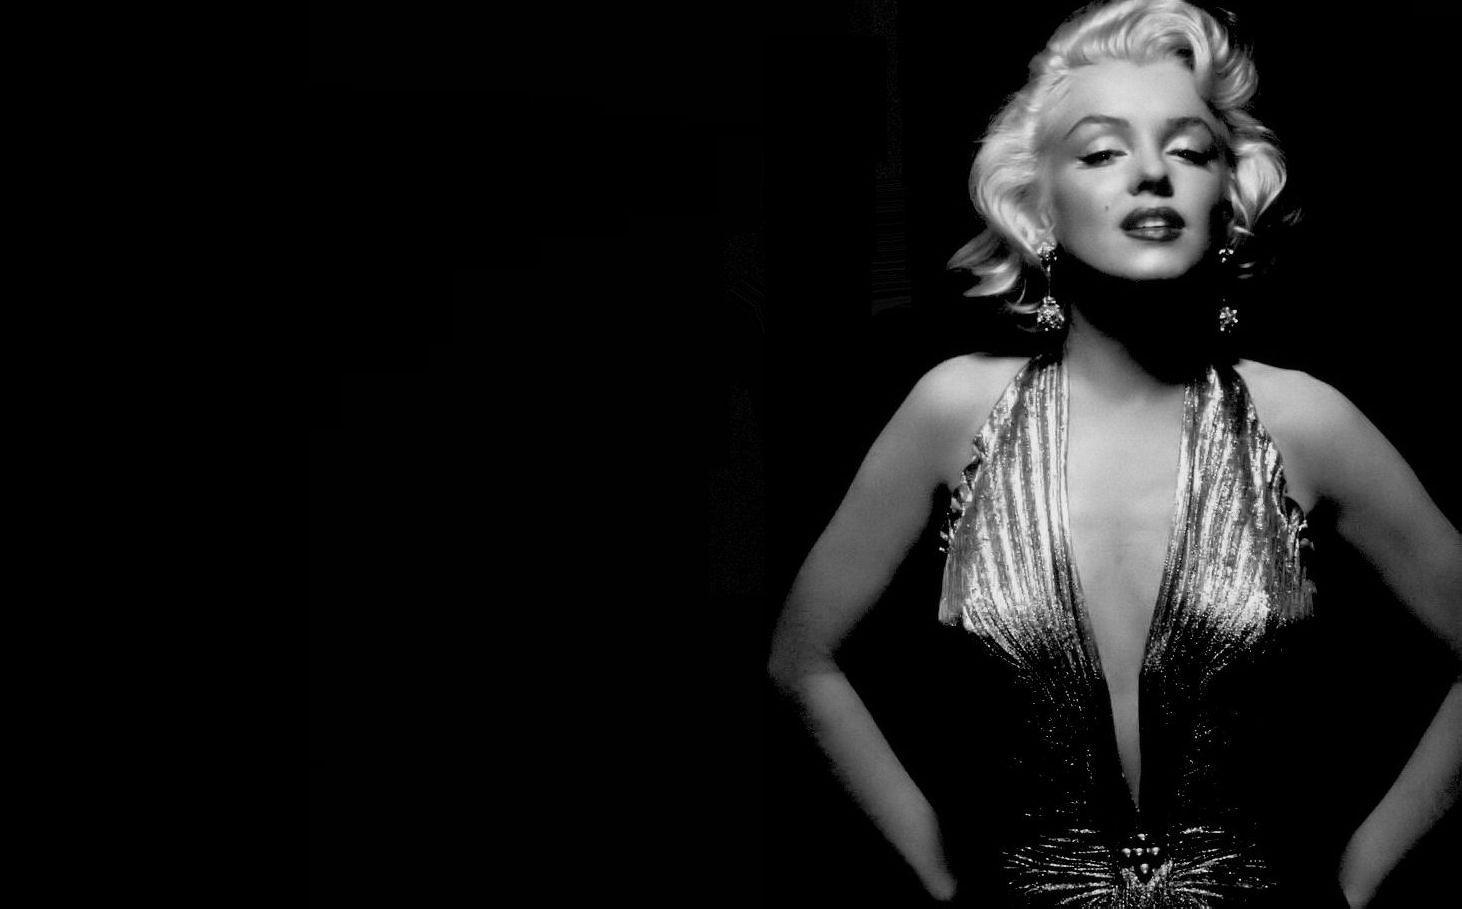 Marilyn Monroe Backgrounds - Wallpaper Cave